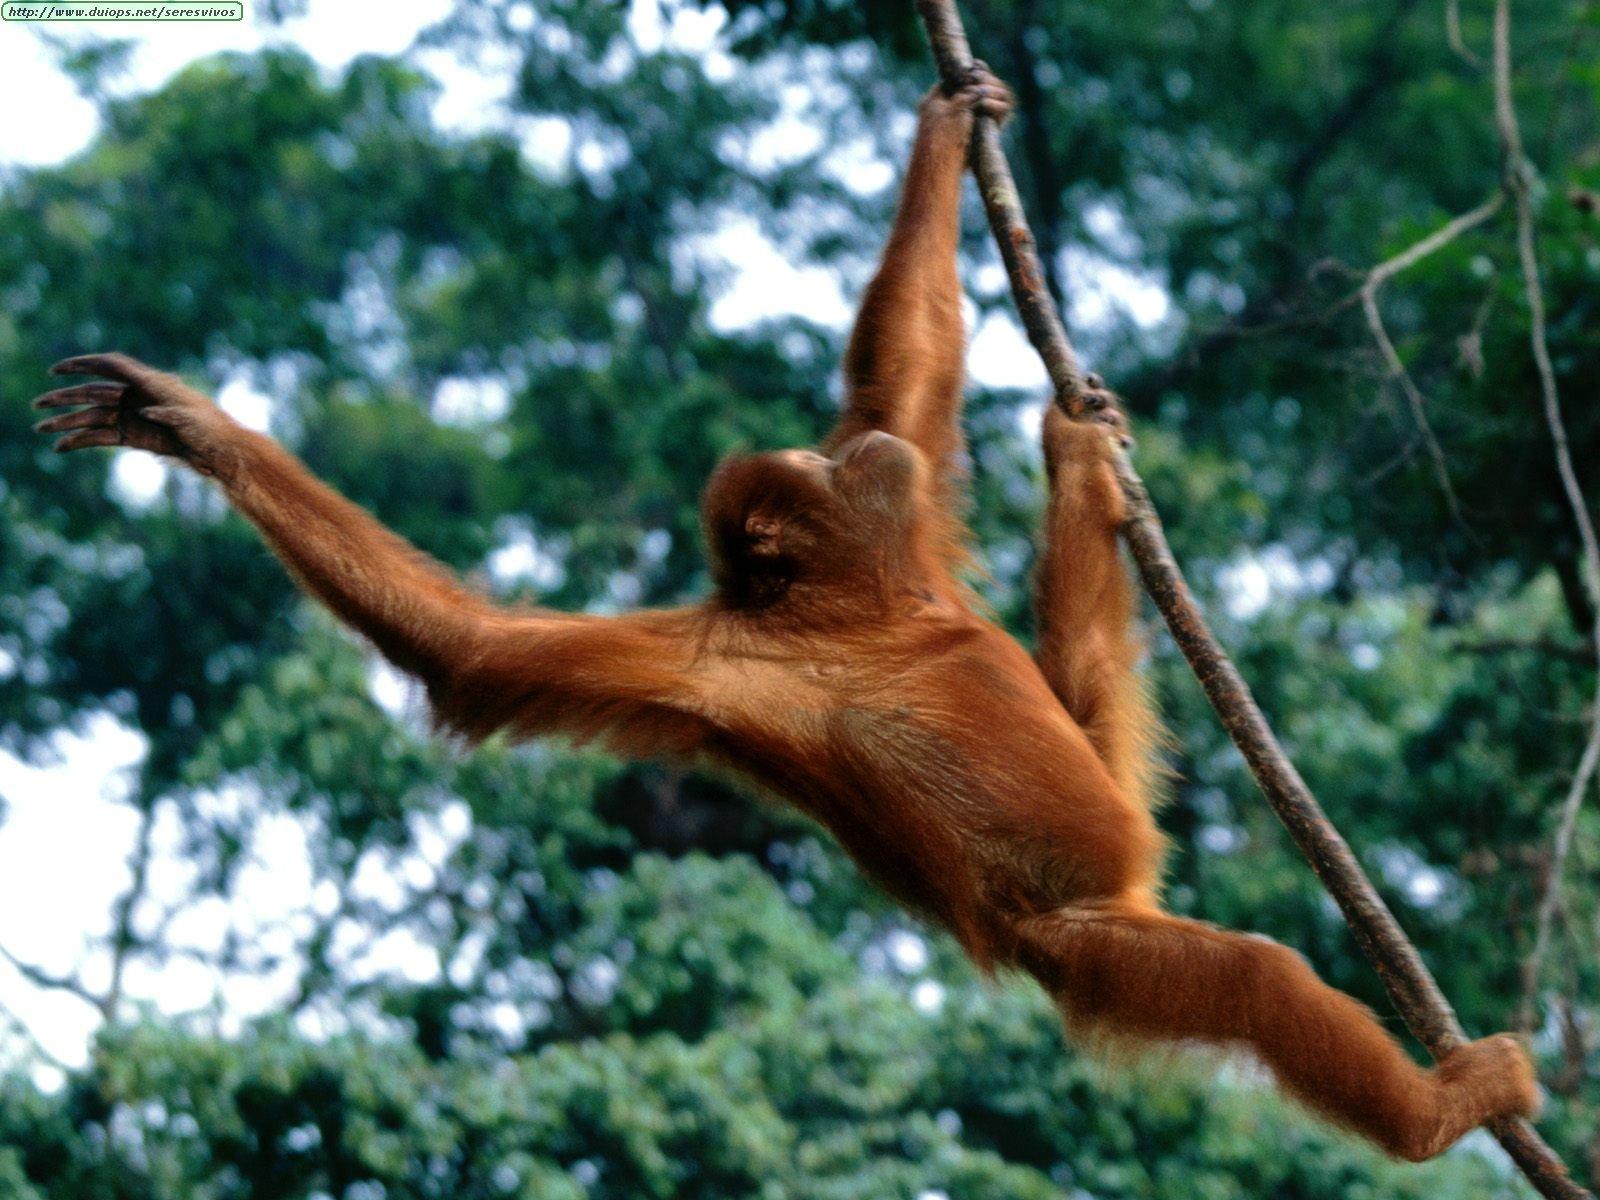 http://www.duiops.net/seresvivos/galeria/orangutanes/Animals%20Orangutans_Just%20Hanging%20Out,%20Sumatran%20Orangutan.jpg